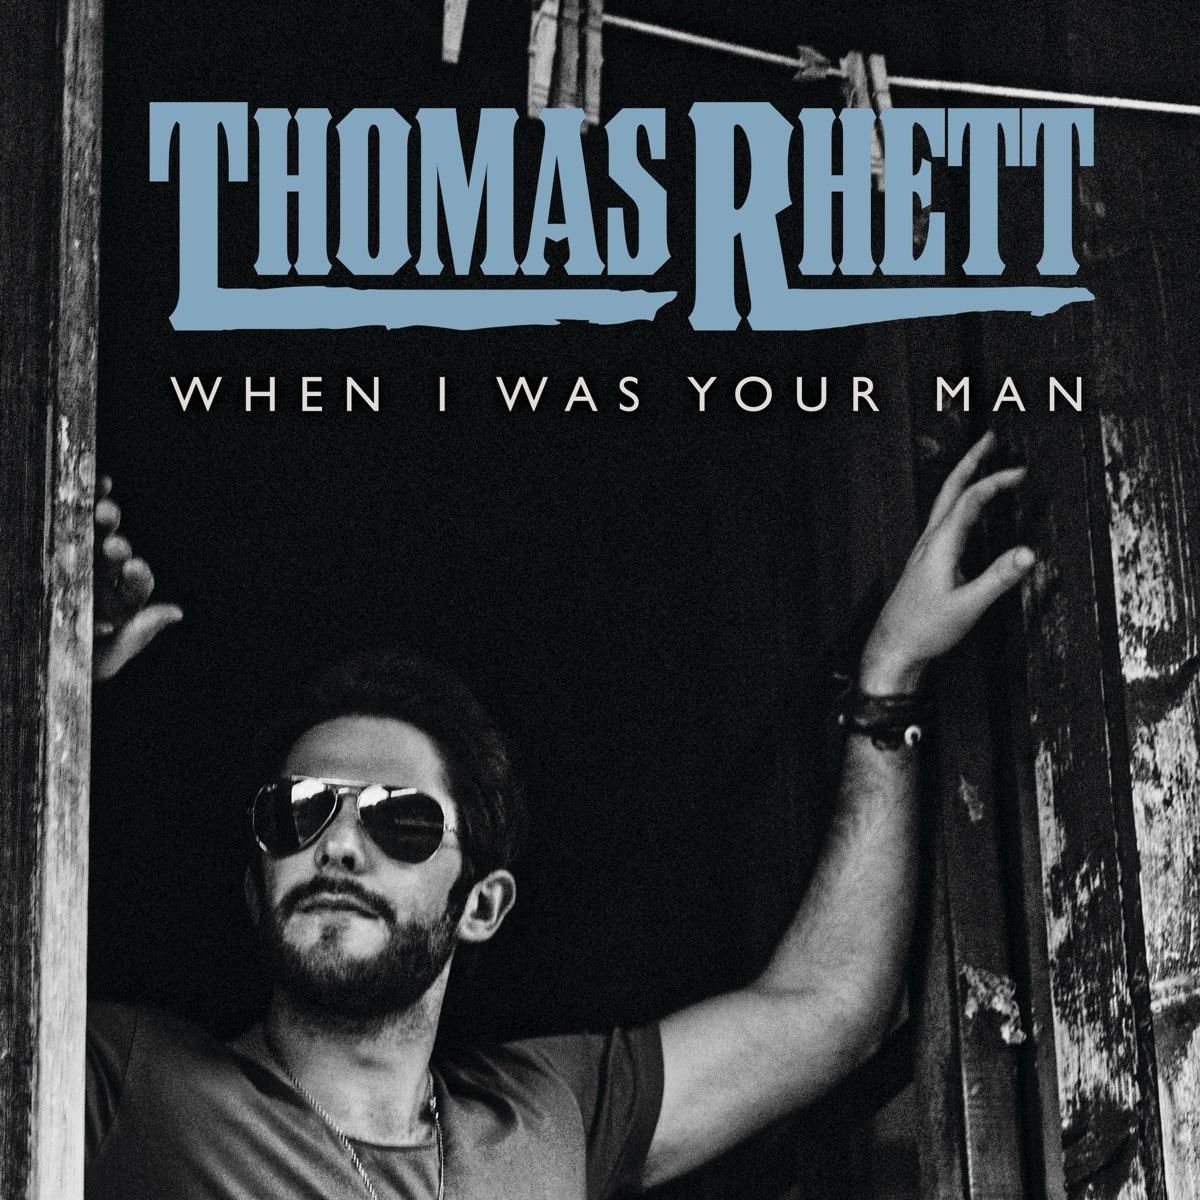 When I Was Your Man - Single Thomas Rhett CD cover